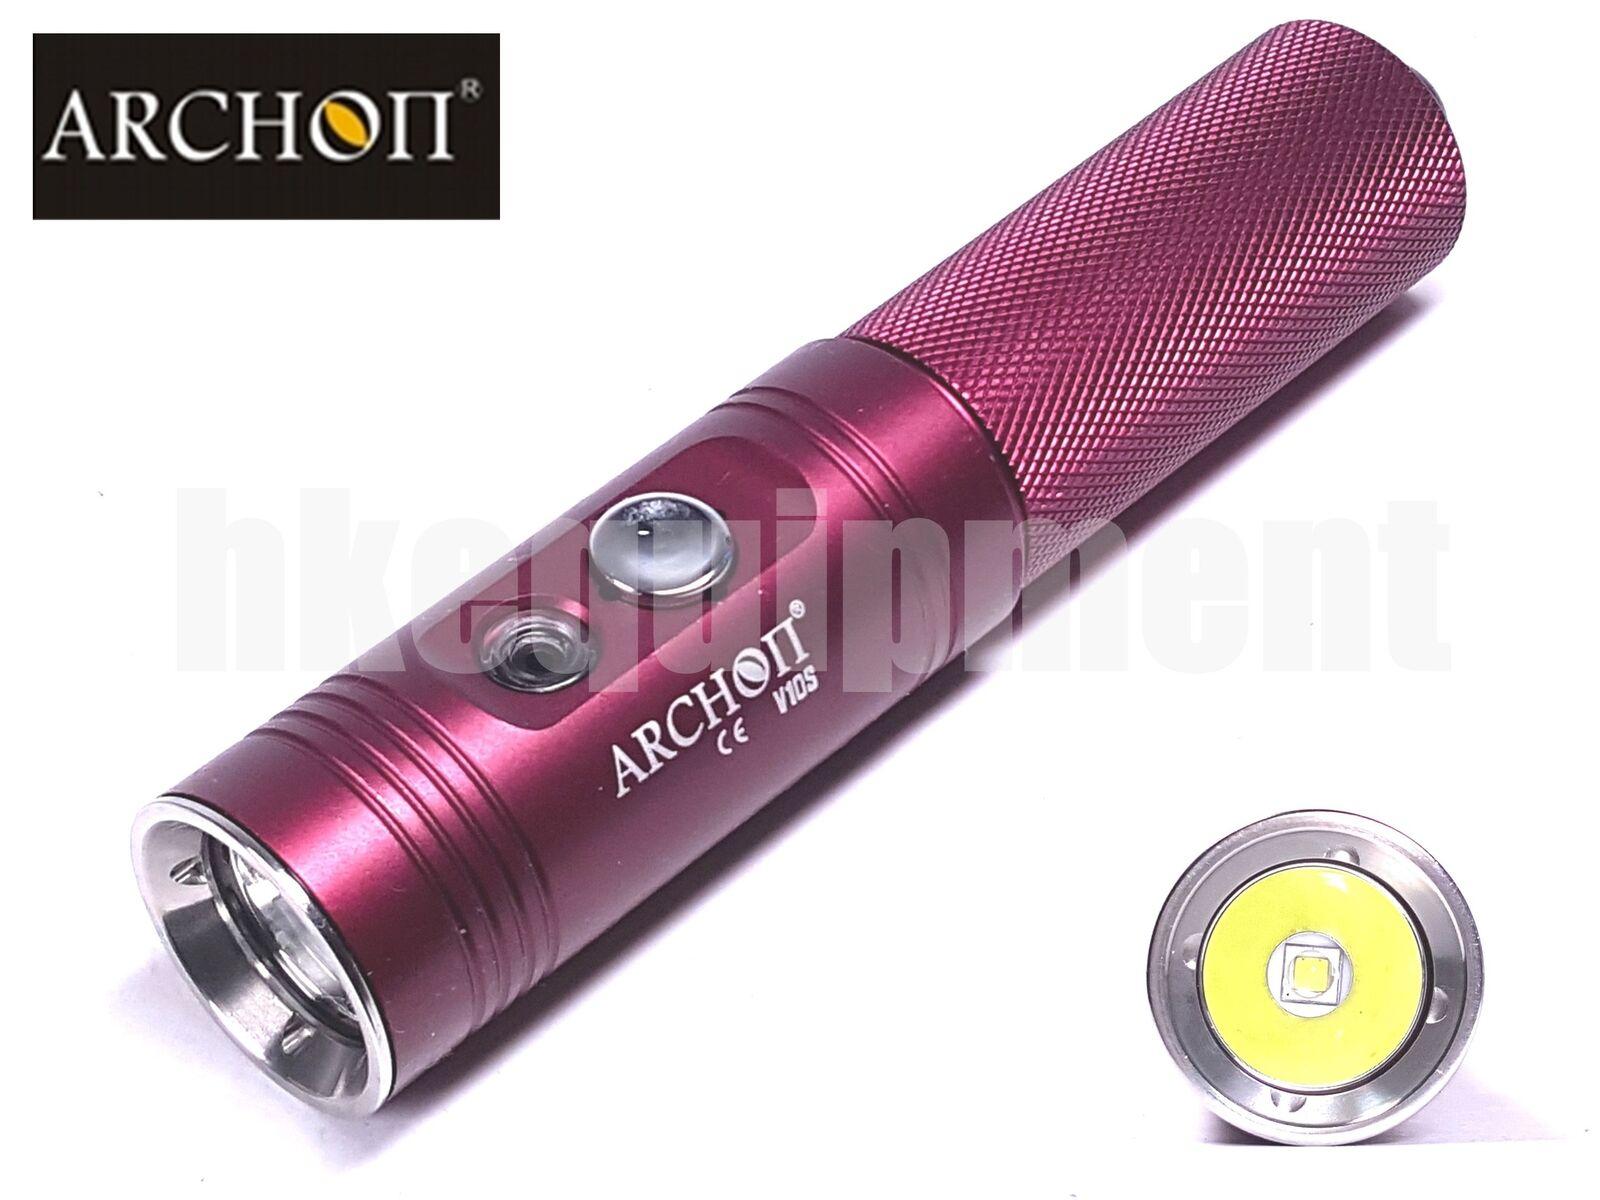 Archon V10S Cree XM-L2 U2 Scuba Diving LED 18650 860lm Torch Red